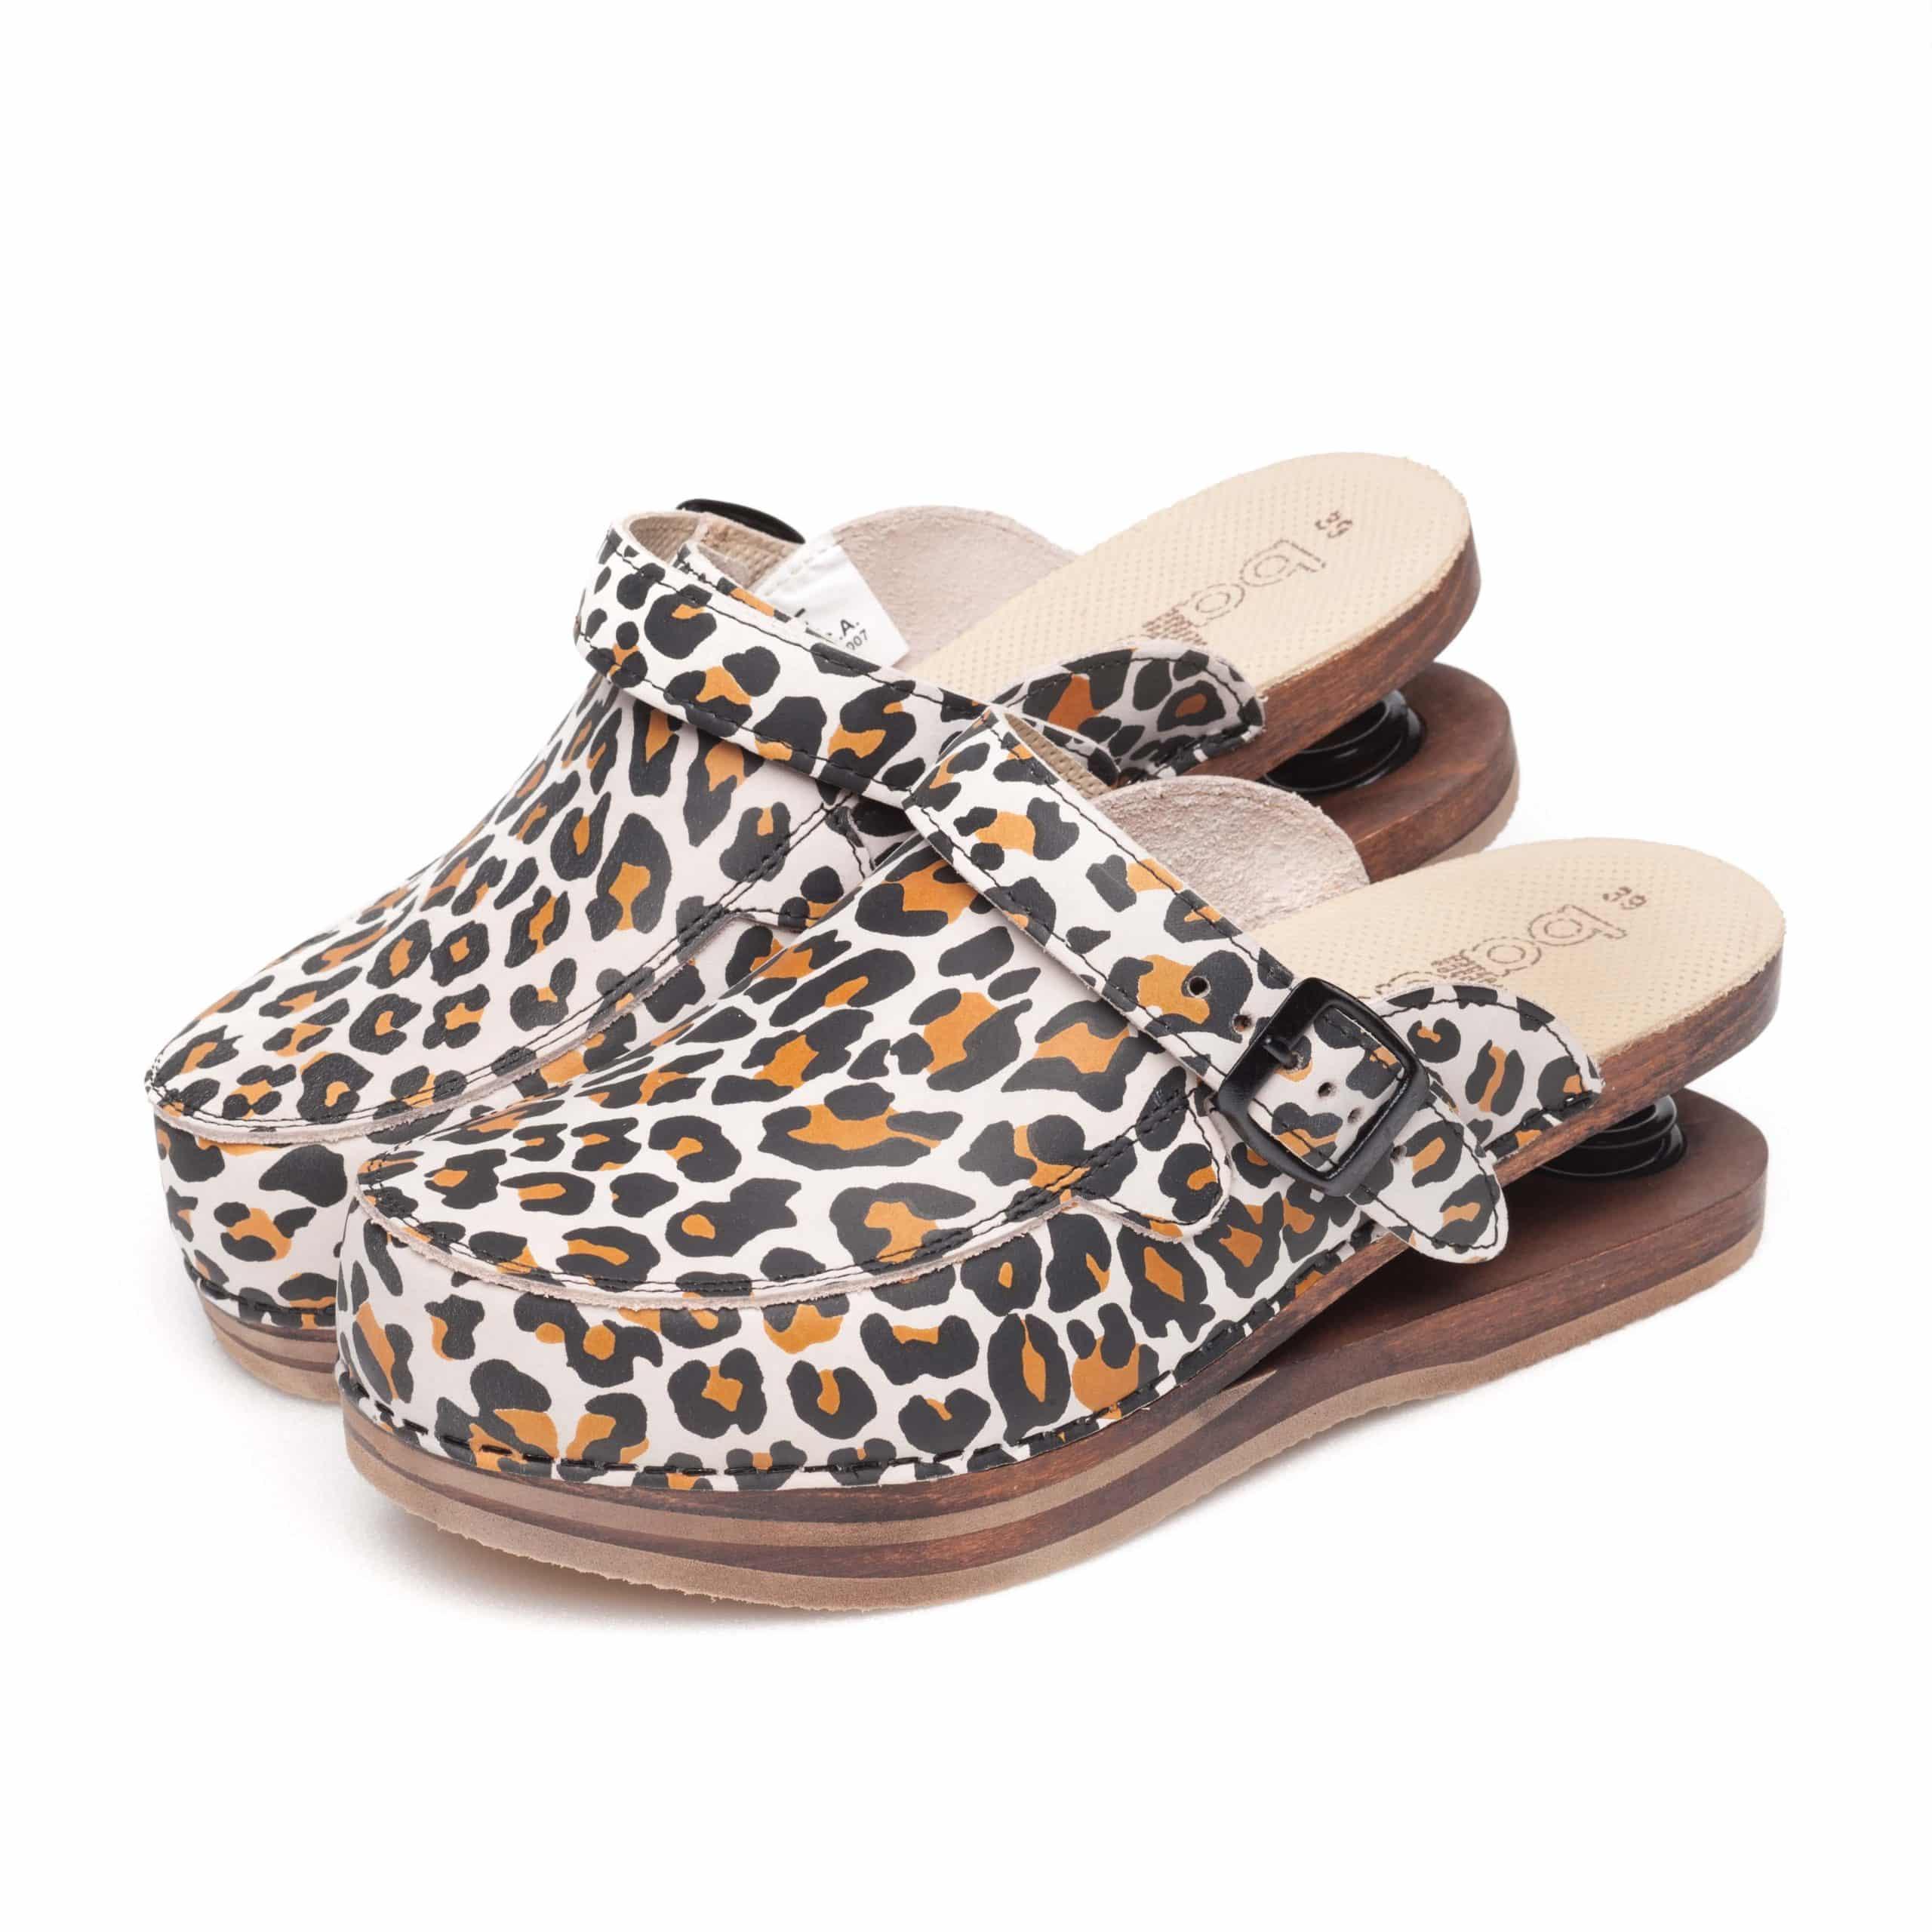 5-19-zoccoli-baldo-leopardati-svizzera